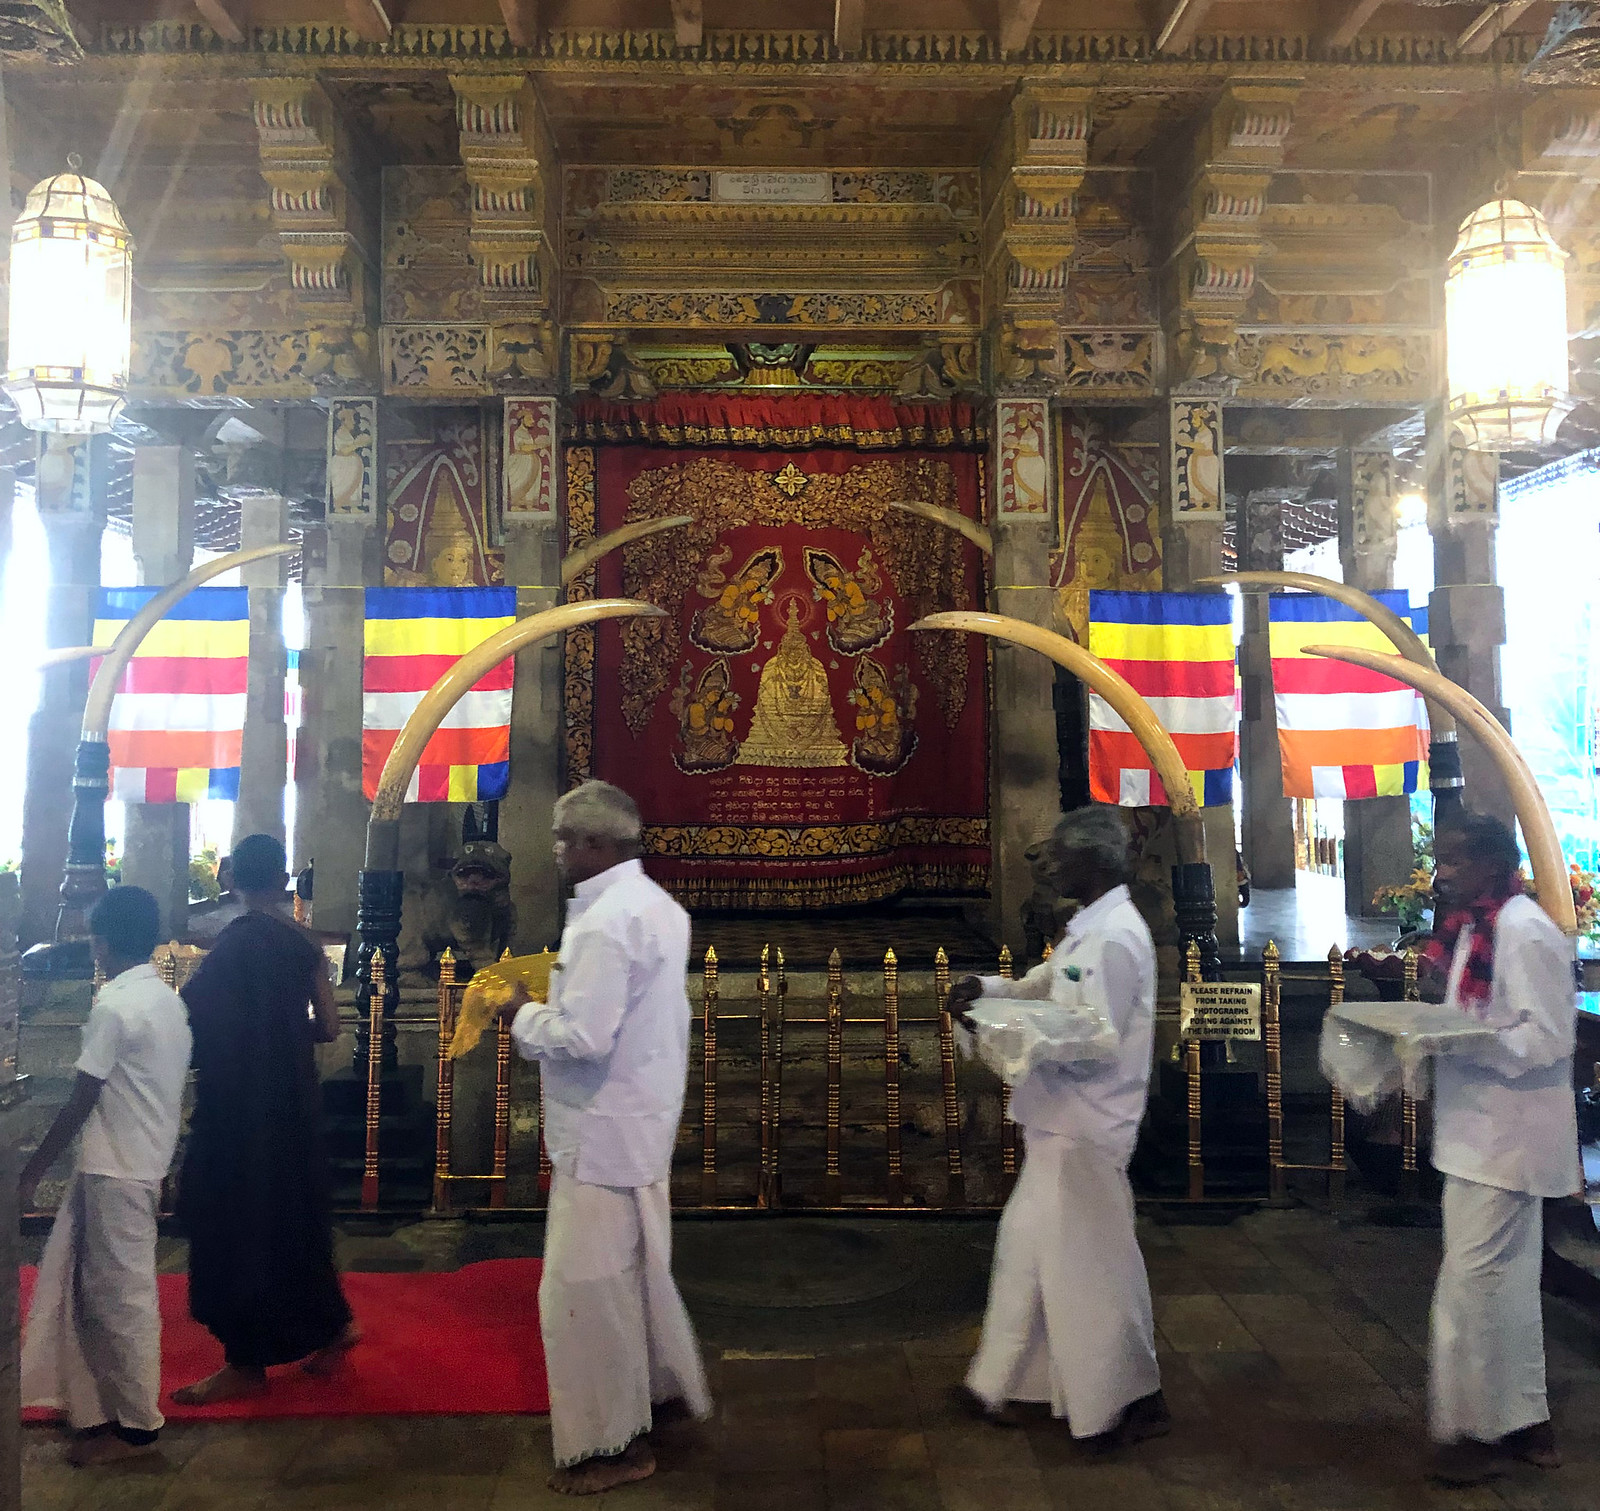 Kandy en un día, Sri Lanka kandy en un día - 47013344782 7df121cc52 h - Kandy en un día, Sri Lanka